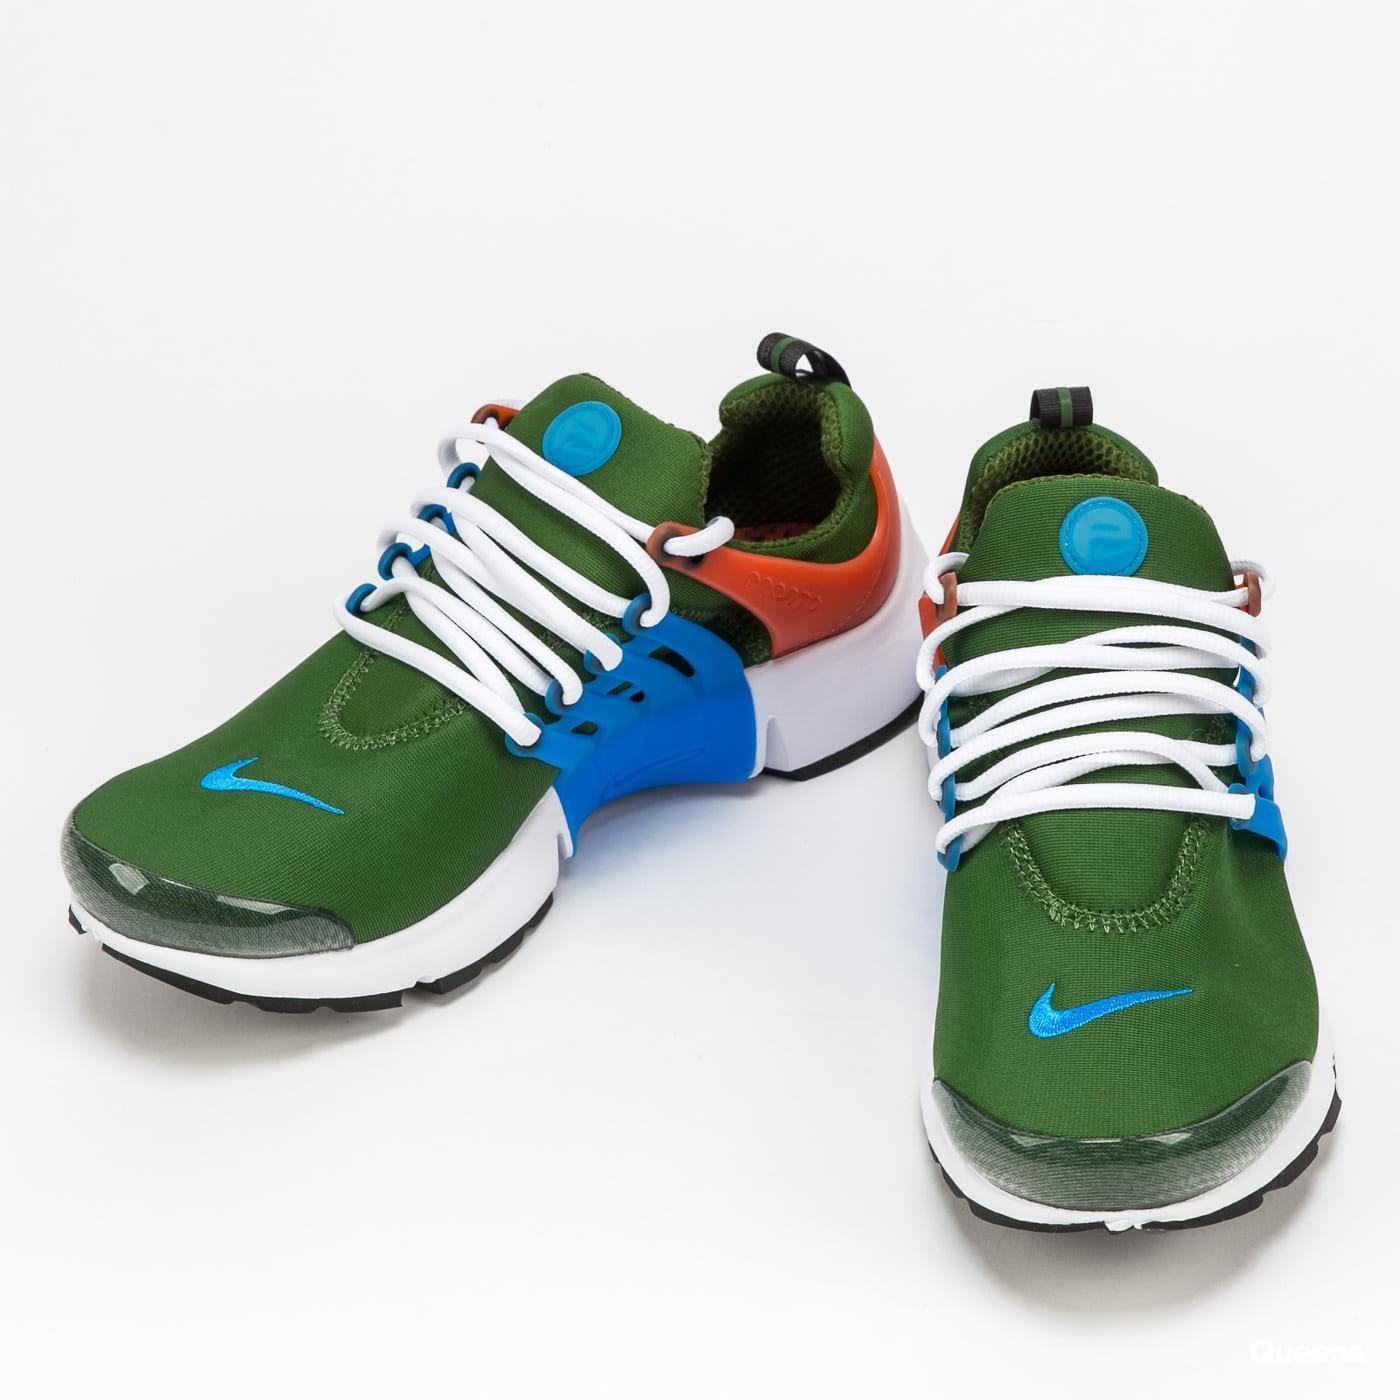 Nike Air Presto forest green / photo blue